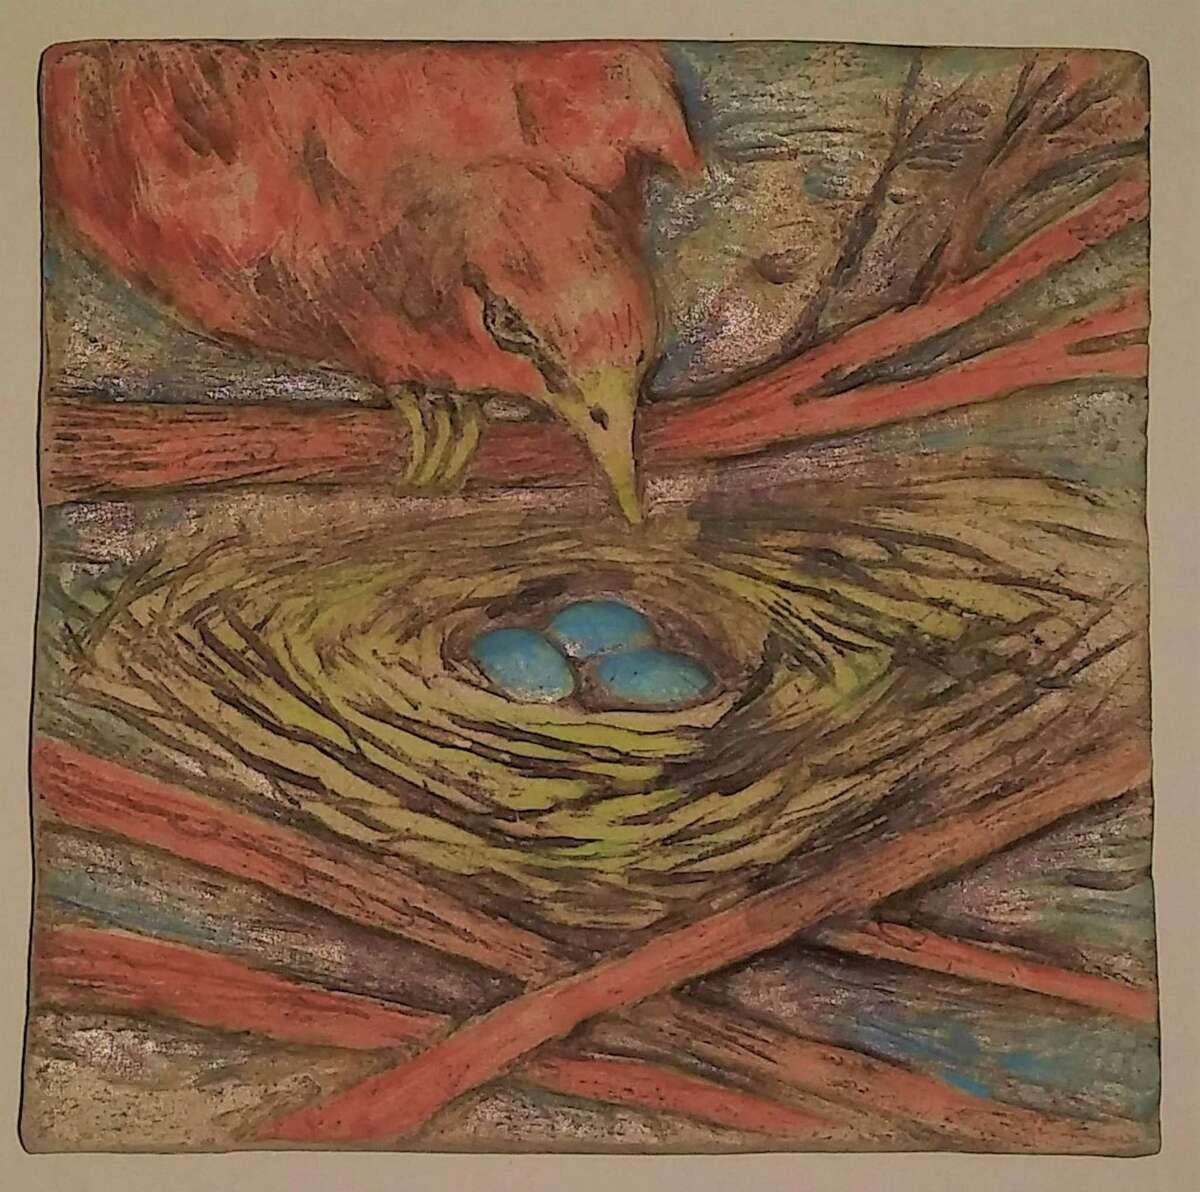 Bird & Nest Tile (7)a€ by Moira O'Grady at Spencertown Academy Arts Center.